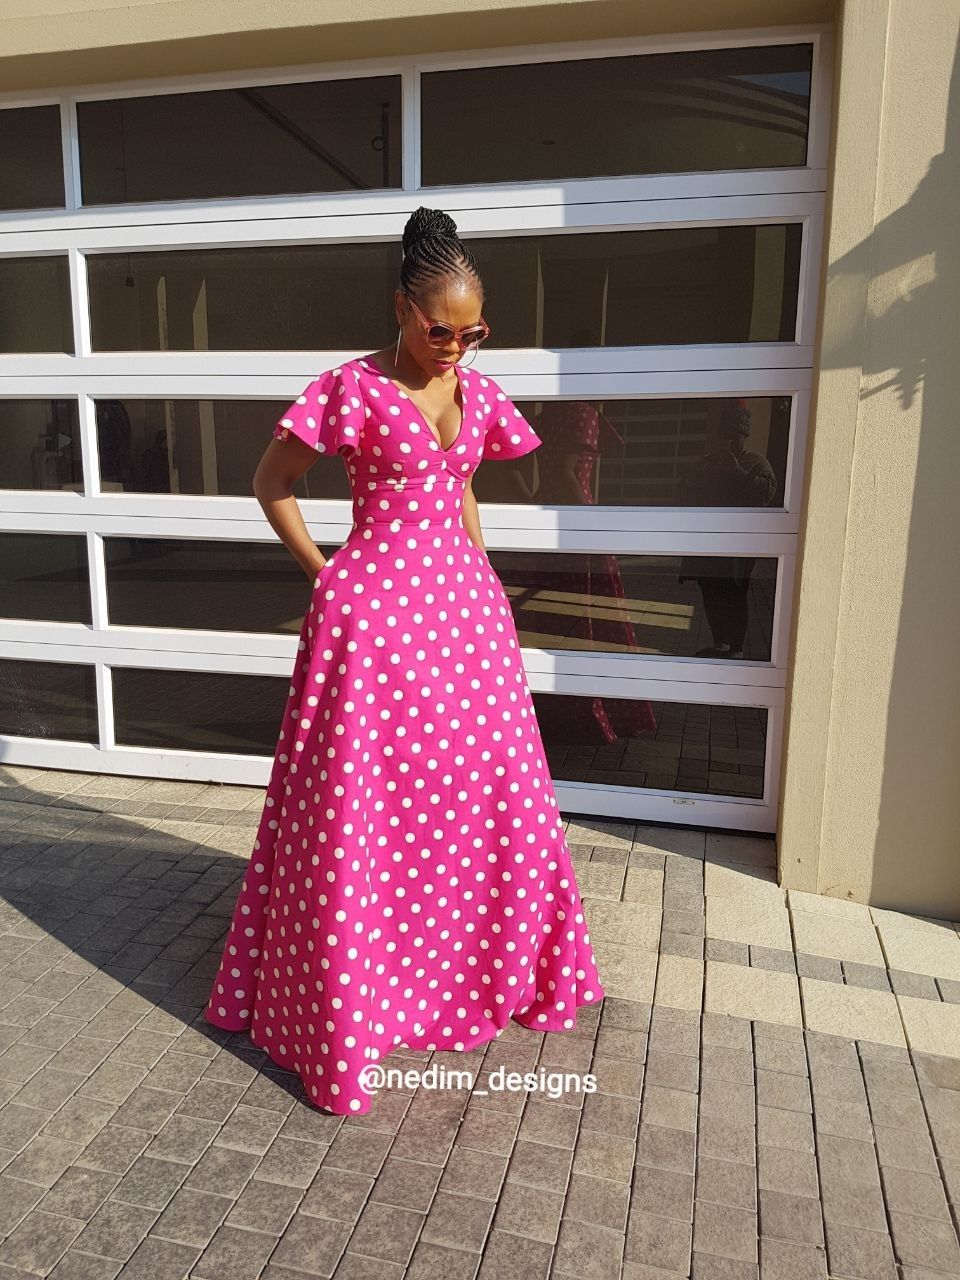 Pin de MASELLO MAKOKWE en @nedim_designs | Pinterest | Africanos ...